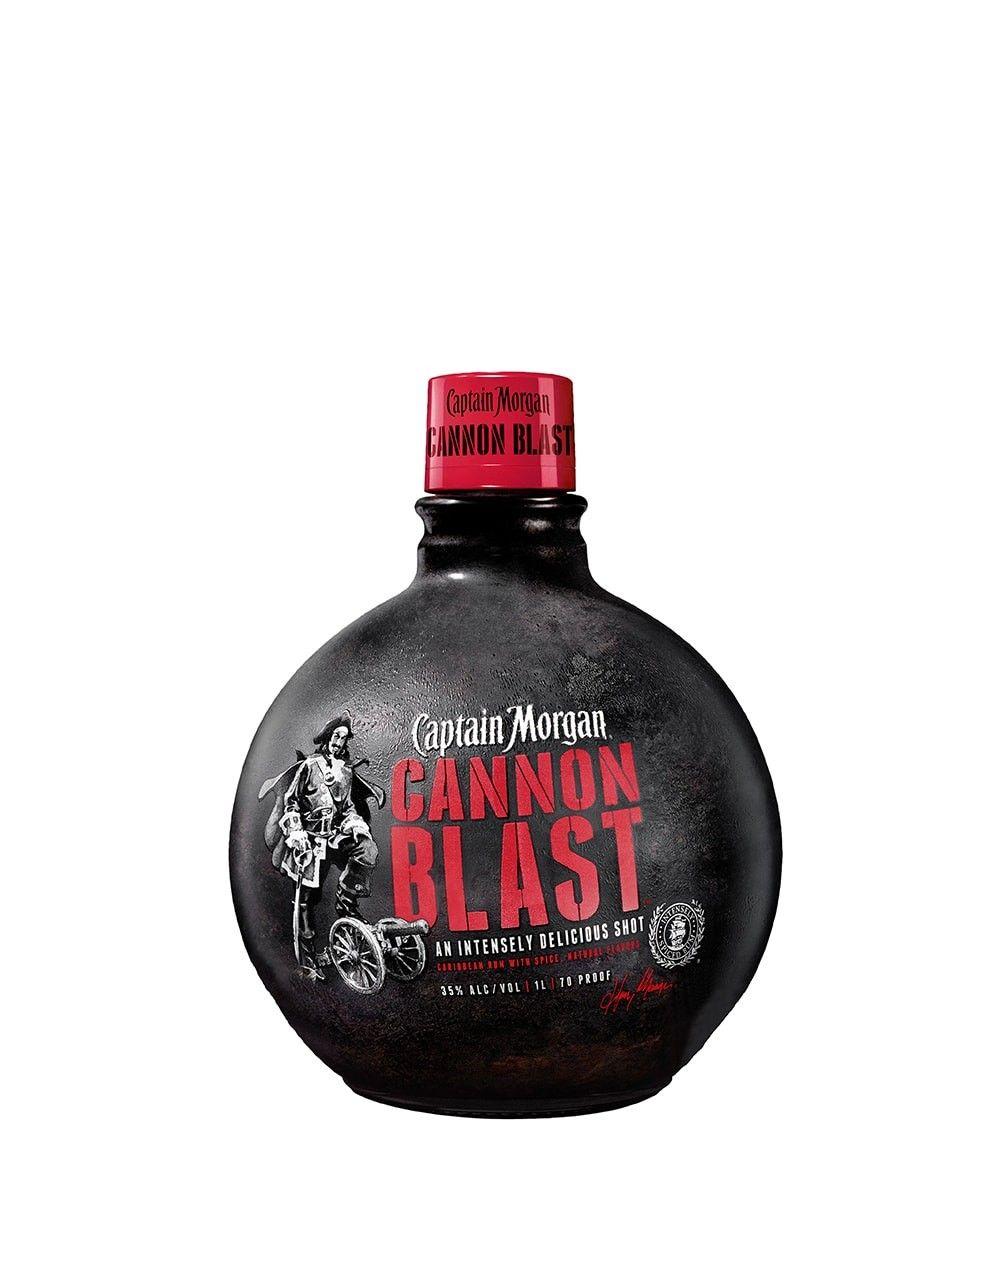 Captain Morgan Cannon Blast Rum Buy Online Or Send As A